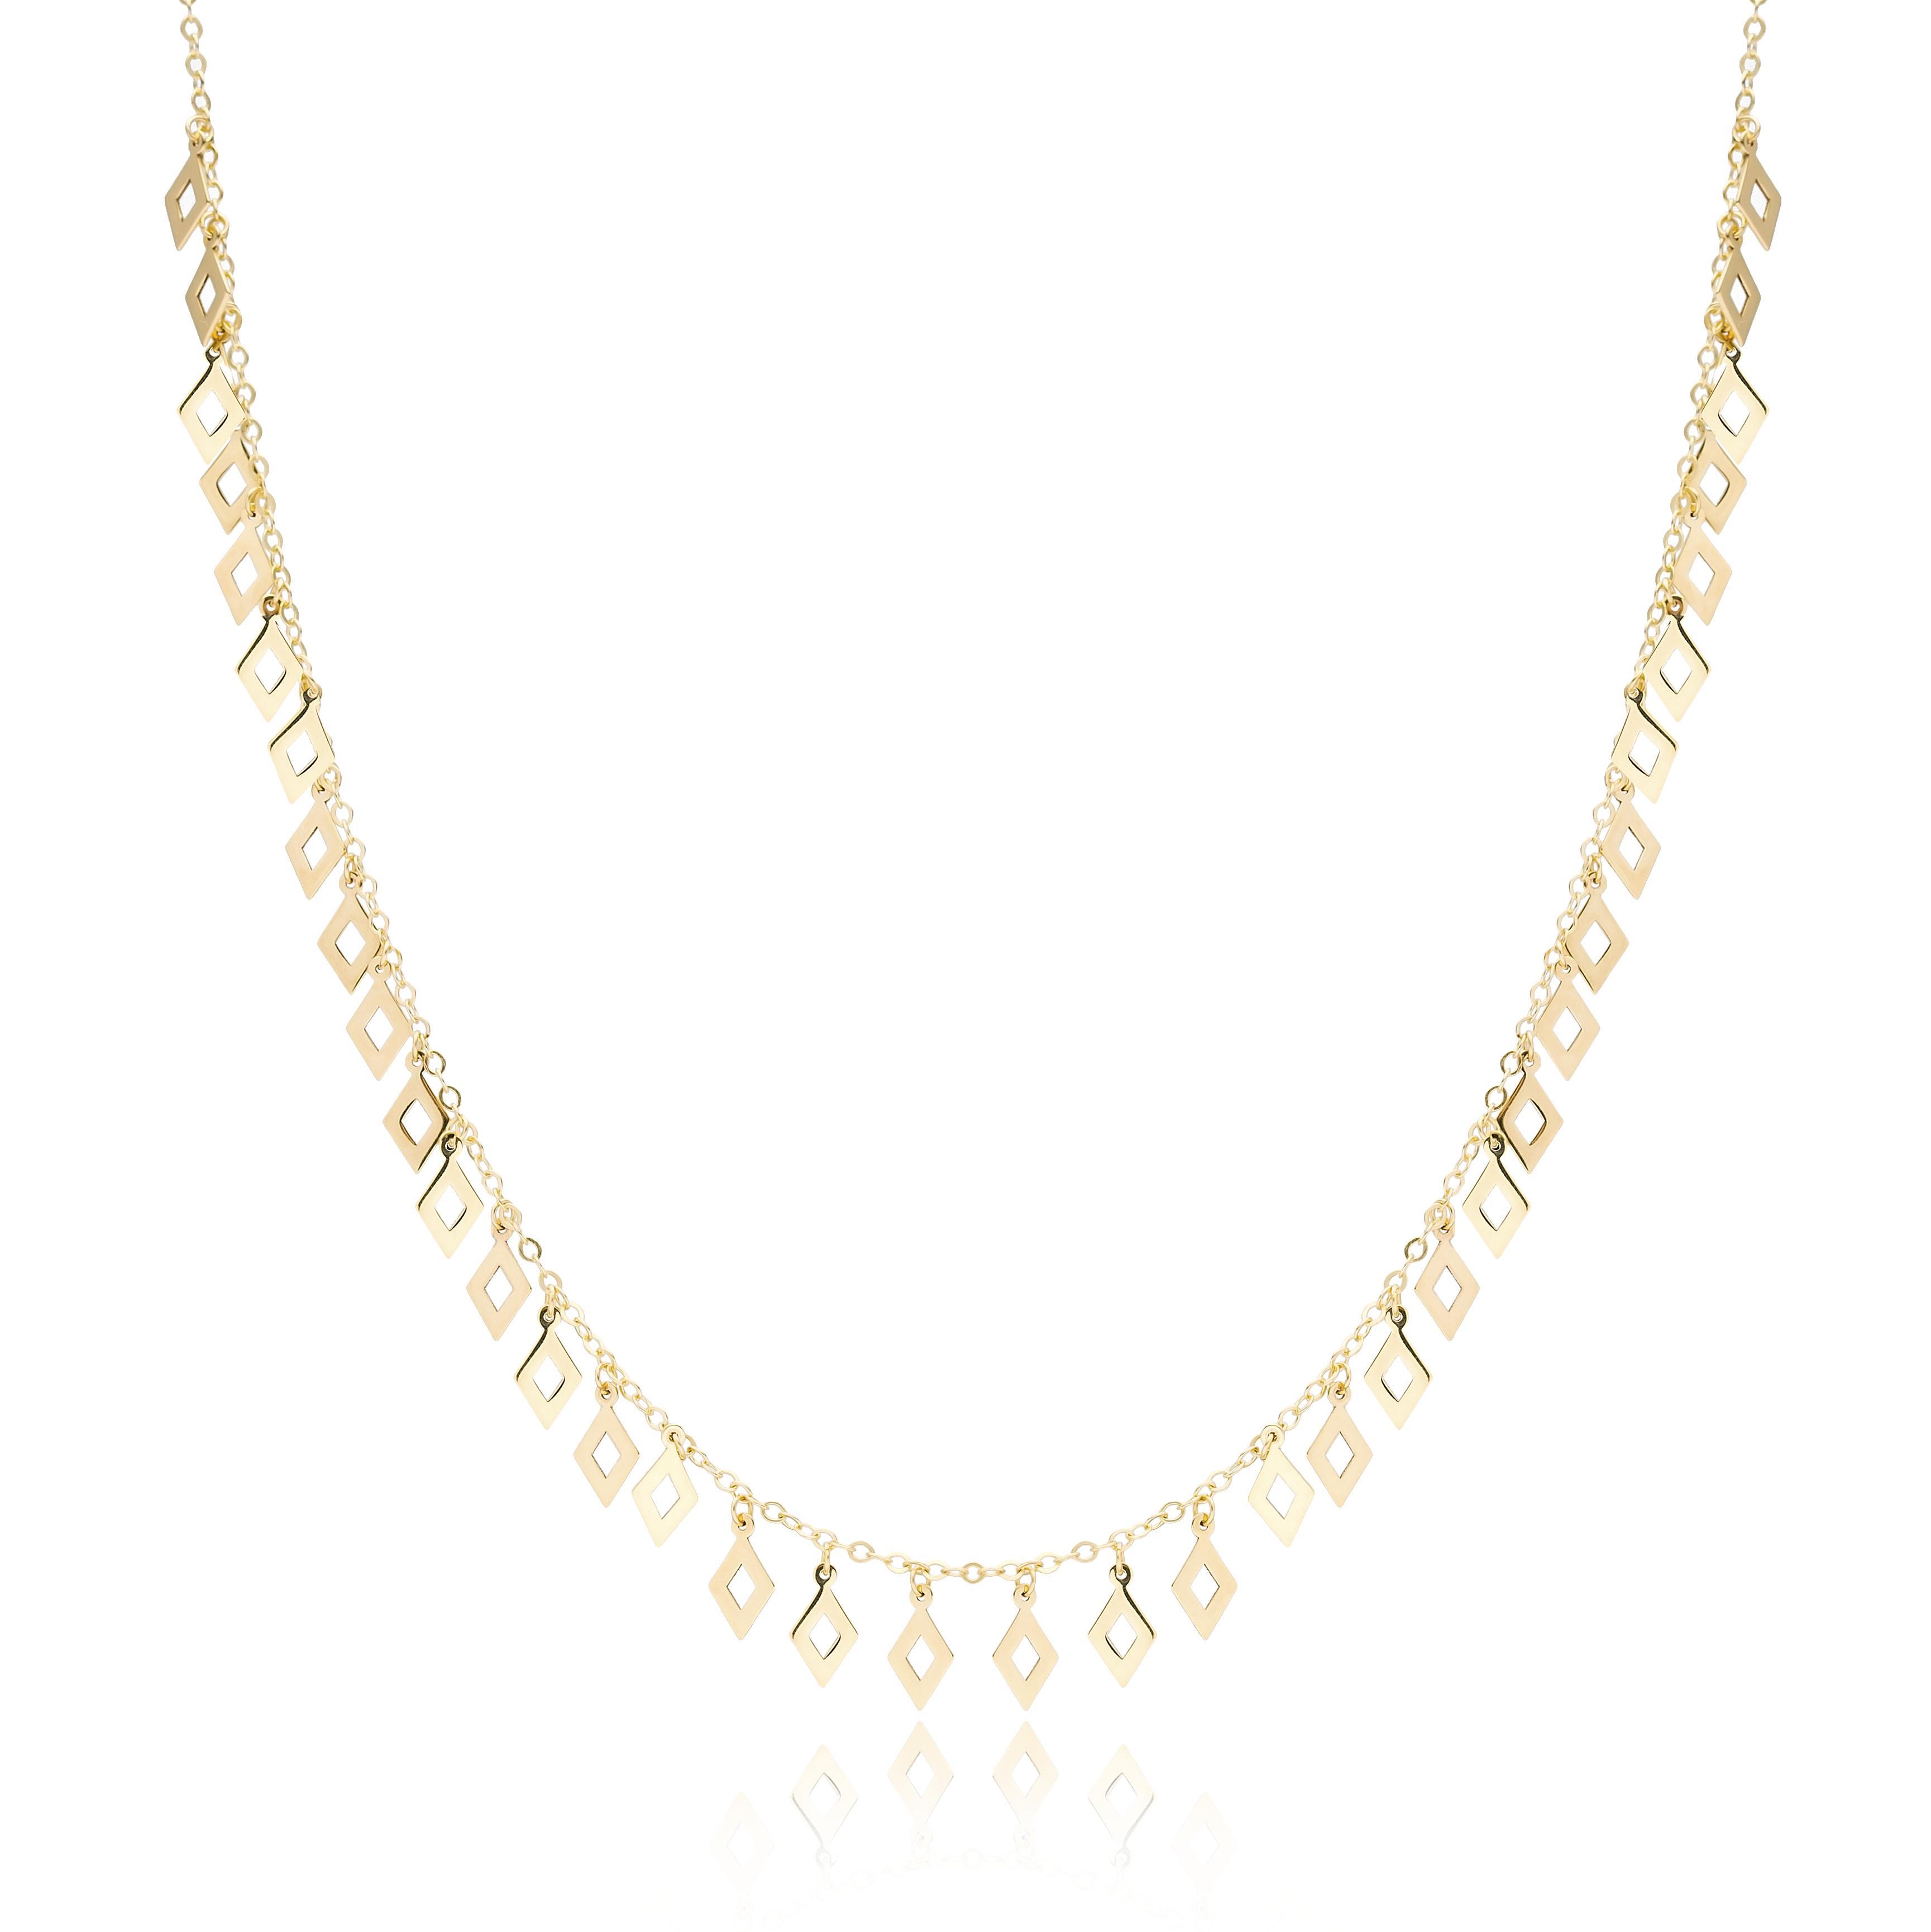 10K Gold Elegant Shaker Rhombus Pendant Wholesale Handmade Turkish Jewelry